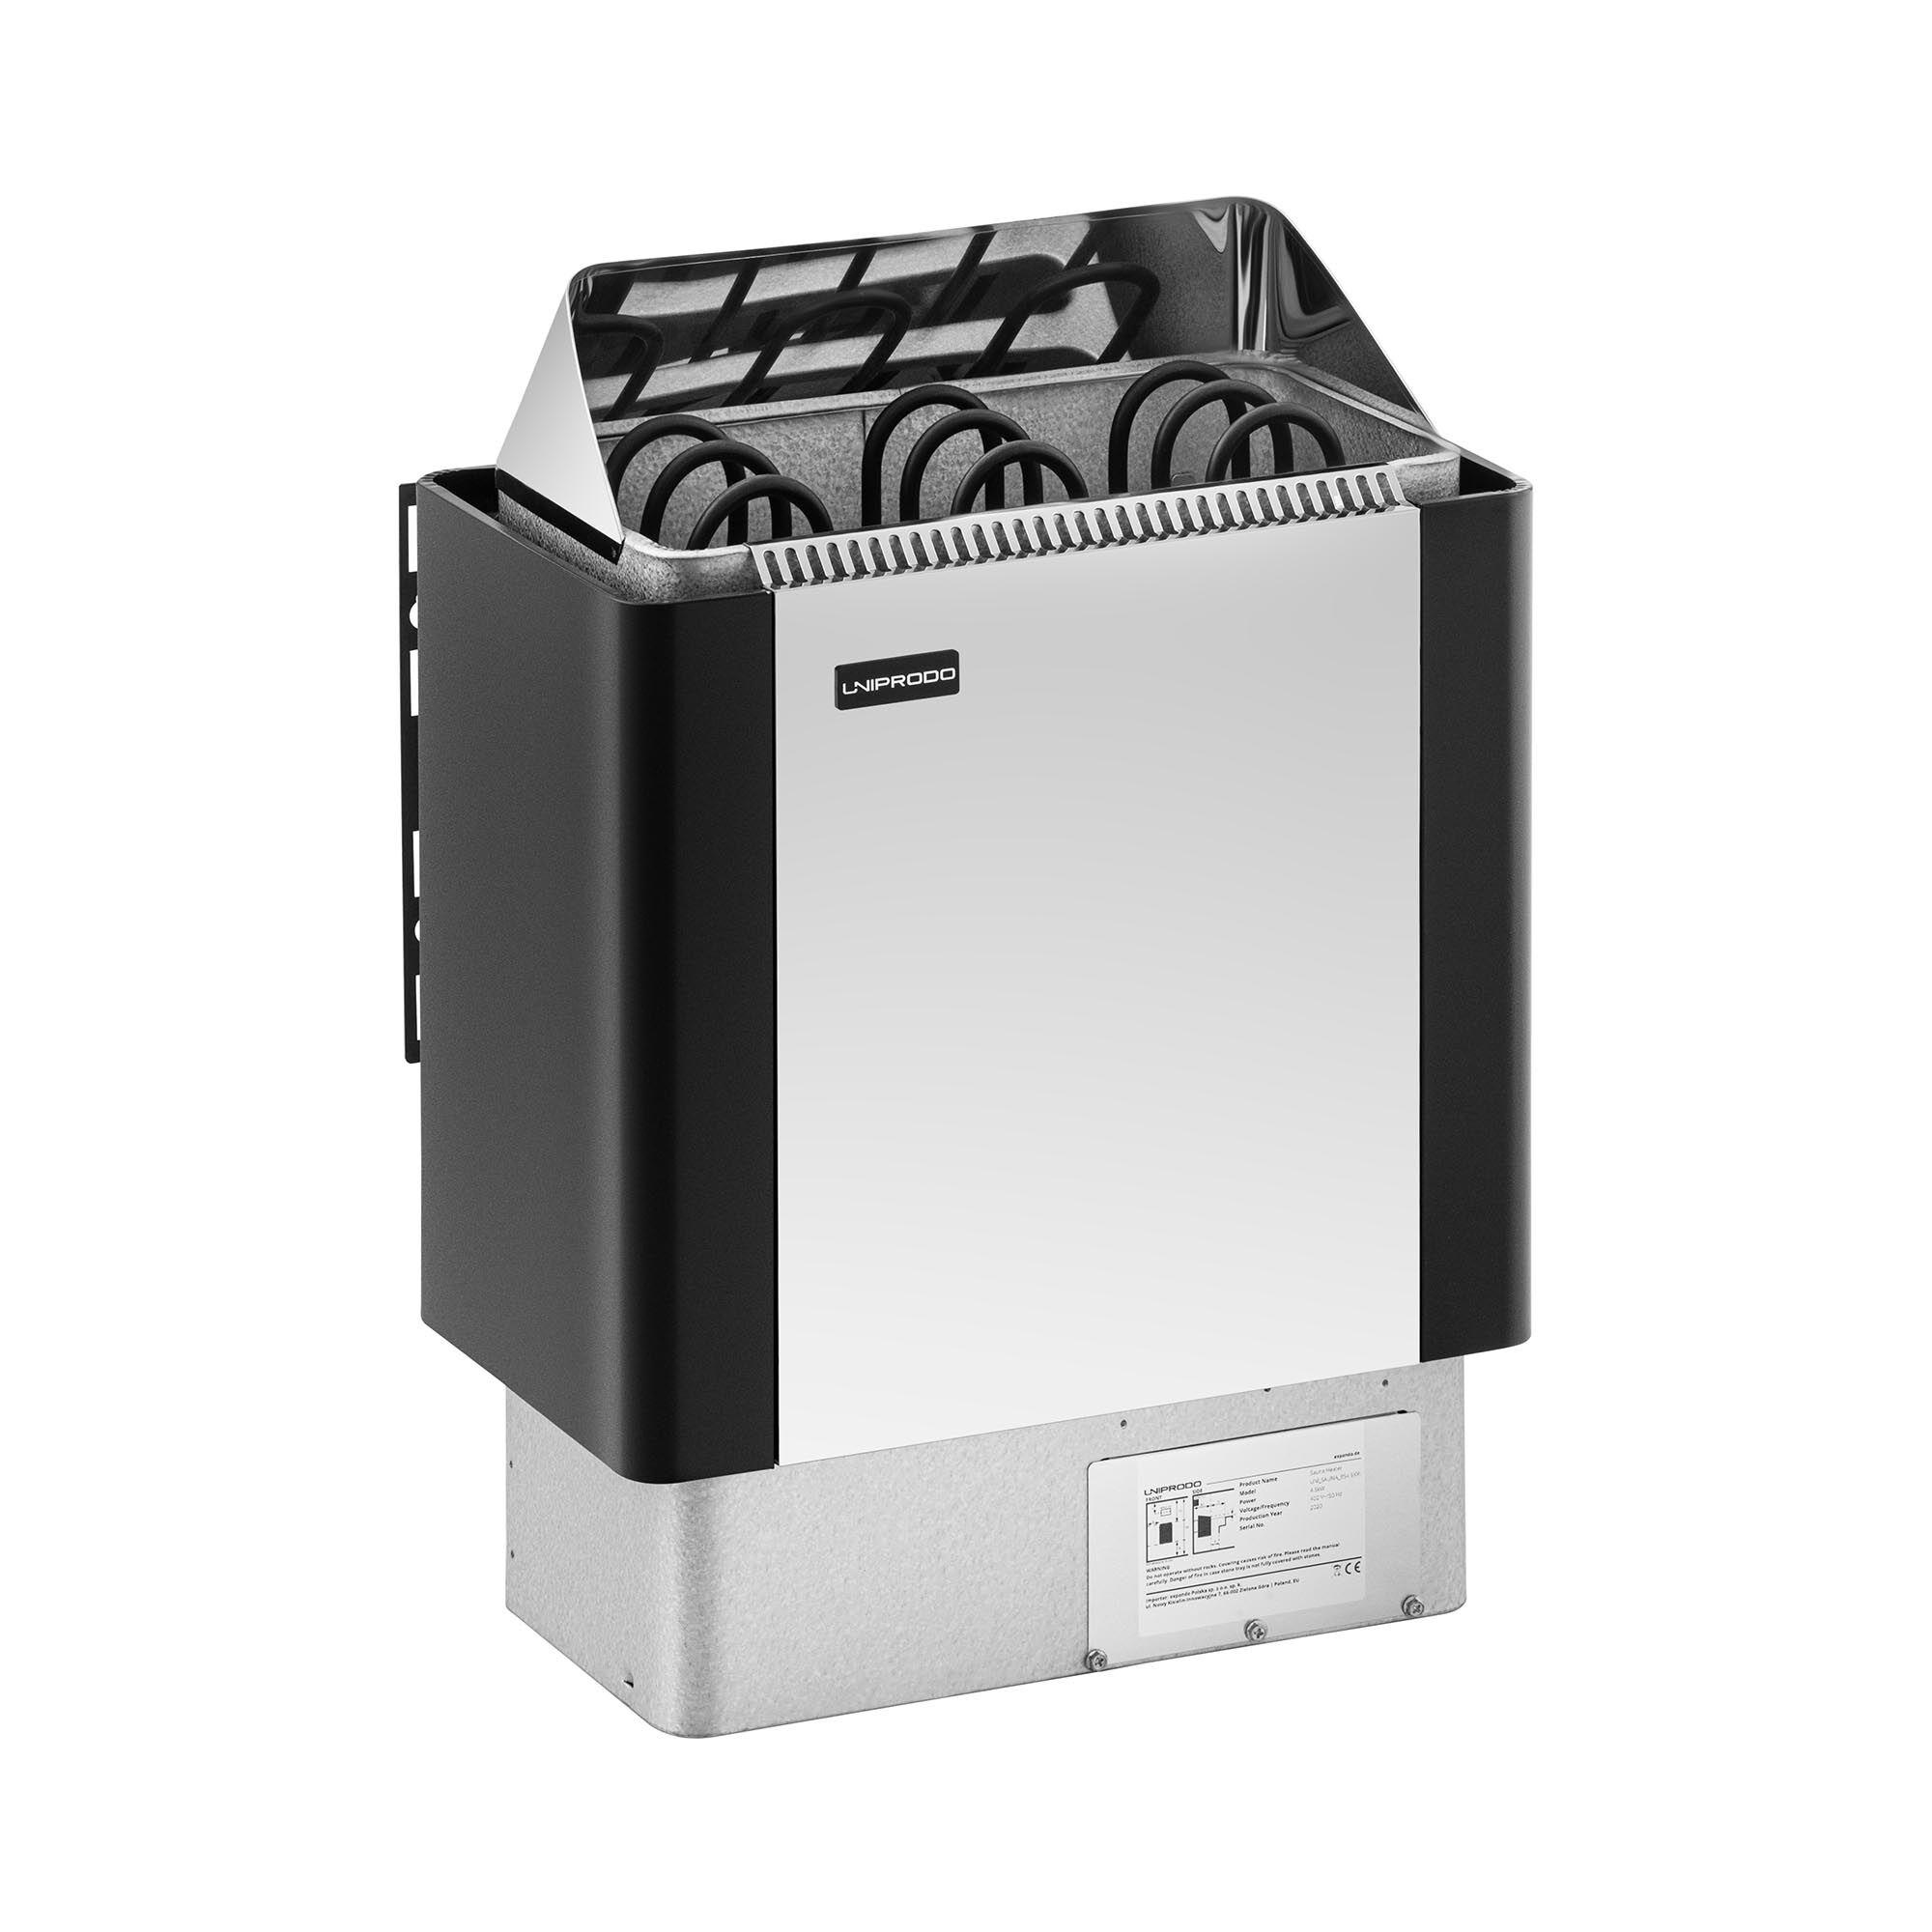 Uniprodo Stufa elettrica per sauna - 4,5 kW - da 30 a 110 °C - diaframma in acciaio inox UNI_SAUNA_BS4.5KW